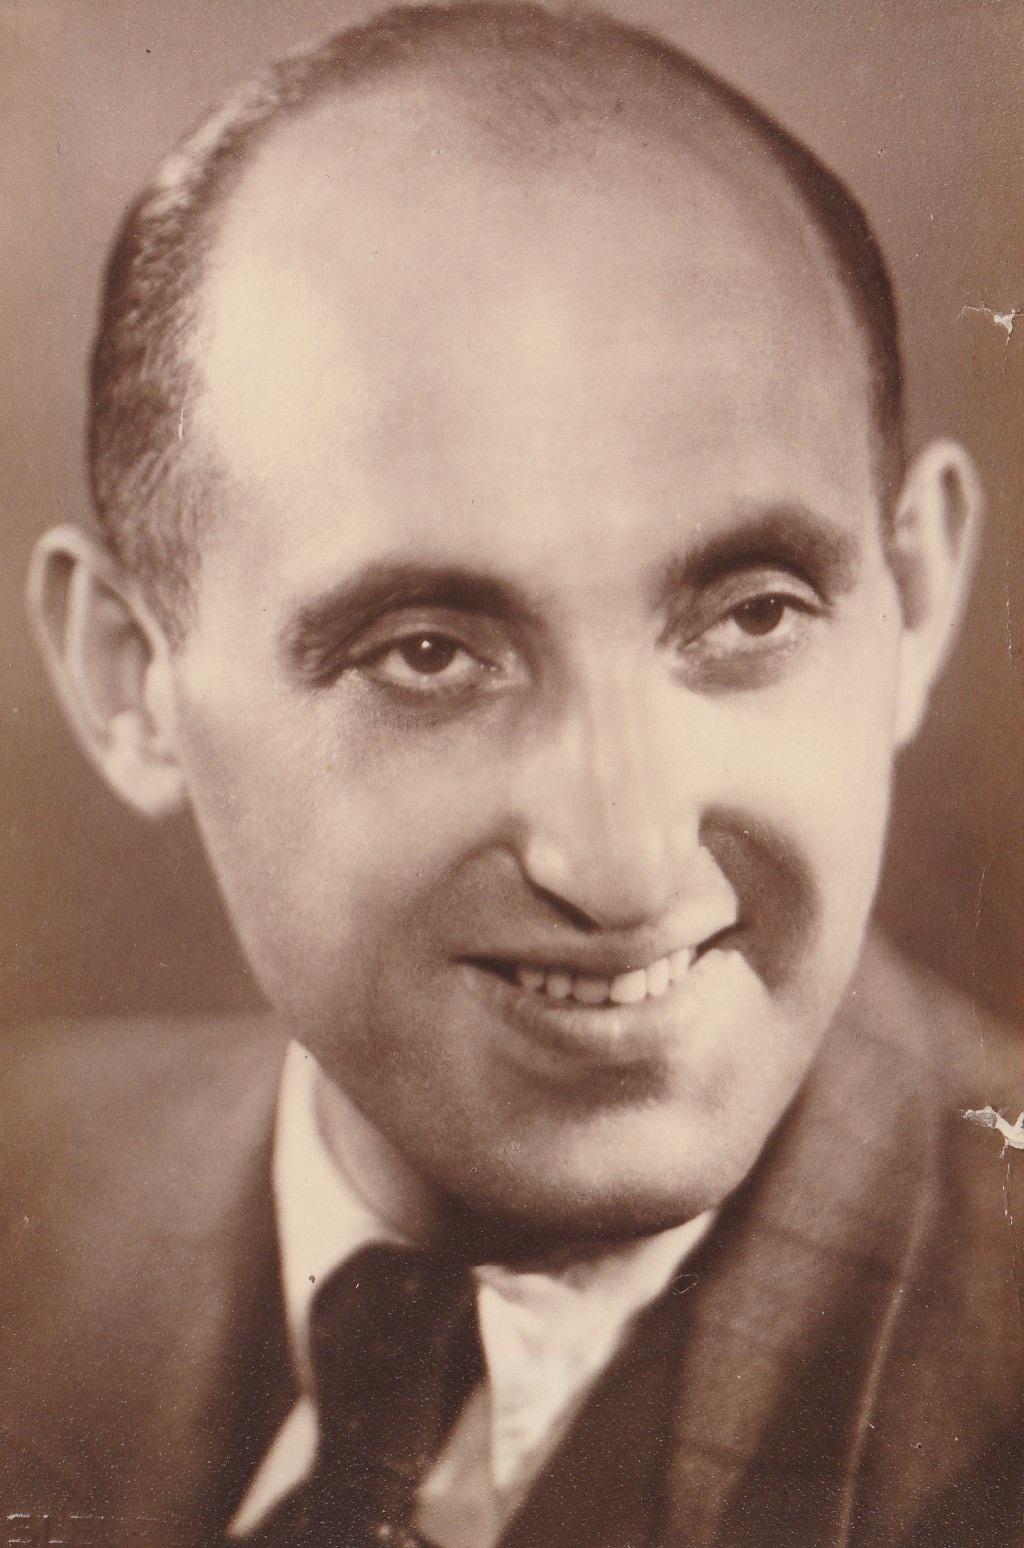 Eddy Karelsen